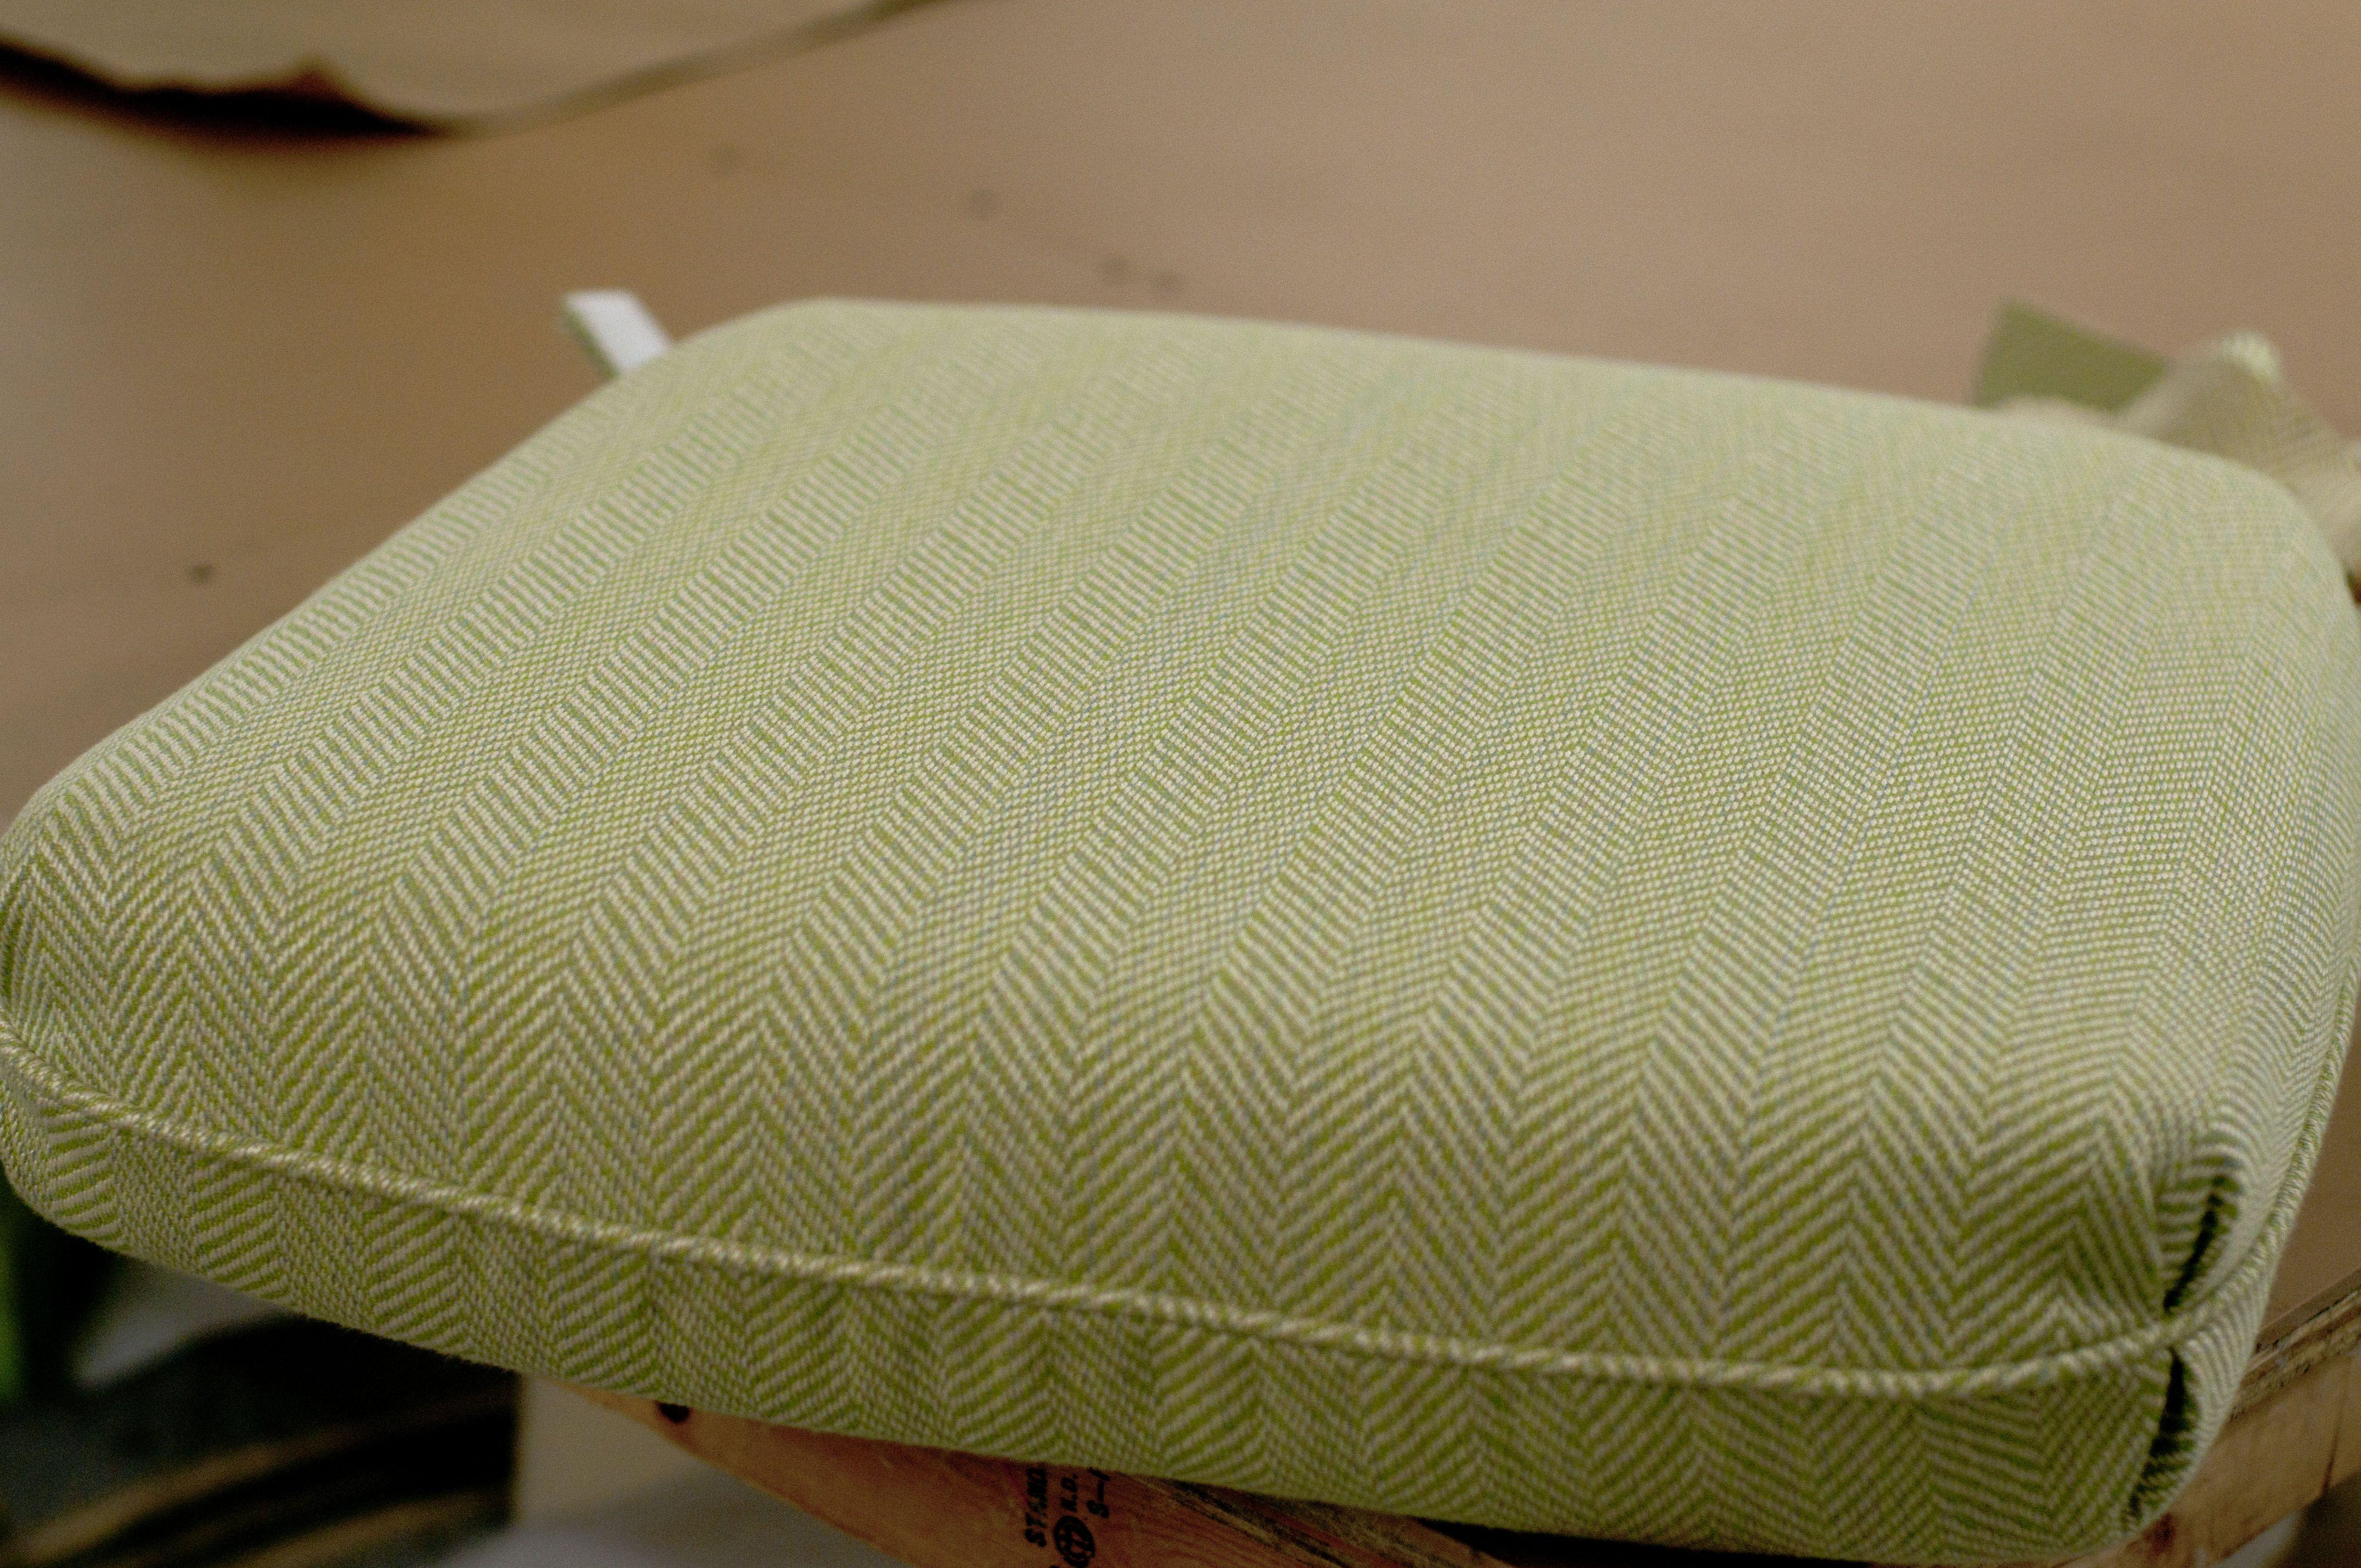 custom indoor chair cushions. Custom Cushion In Sunbrella Posh Lime. CushionsChair CushionsLimes Indoor Chair Cushions O